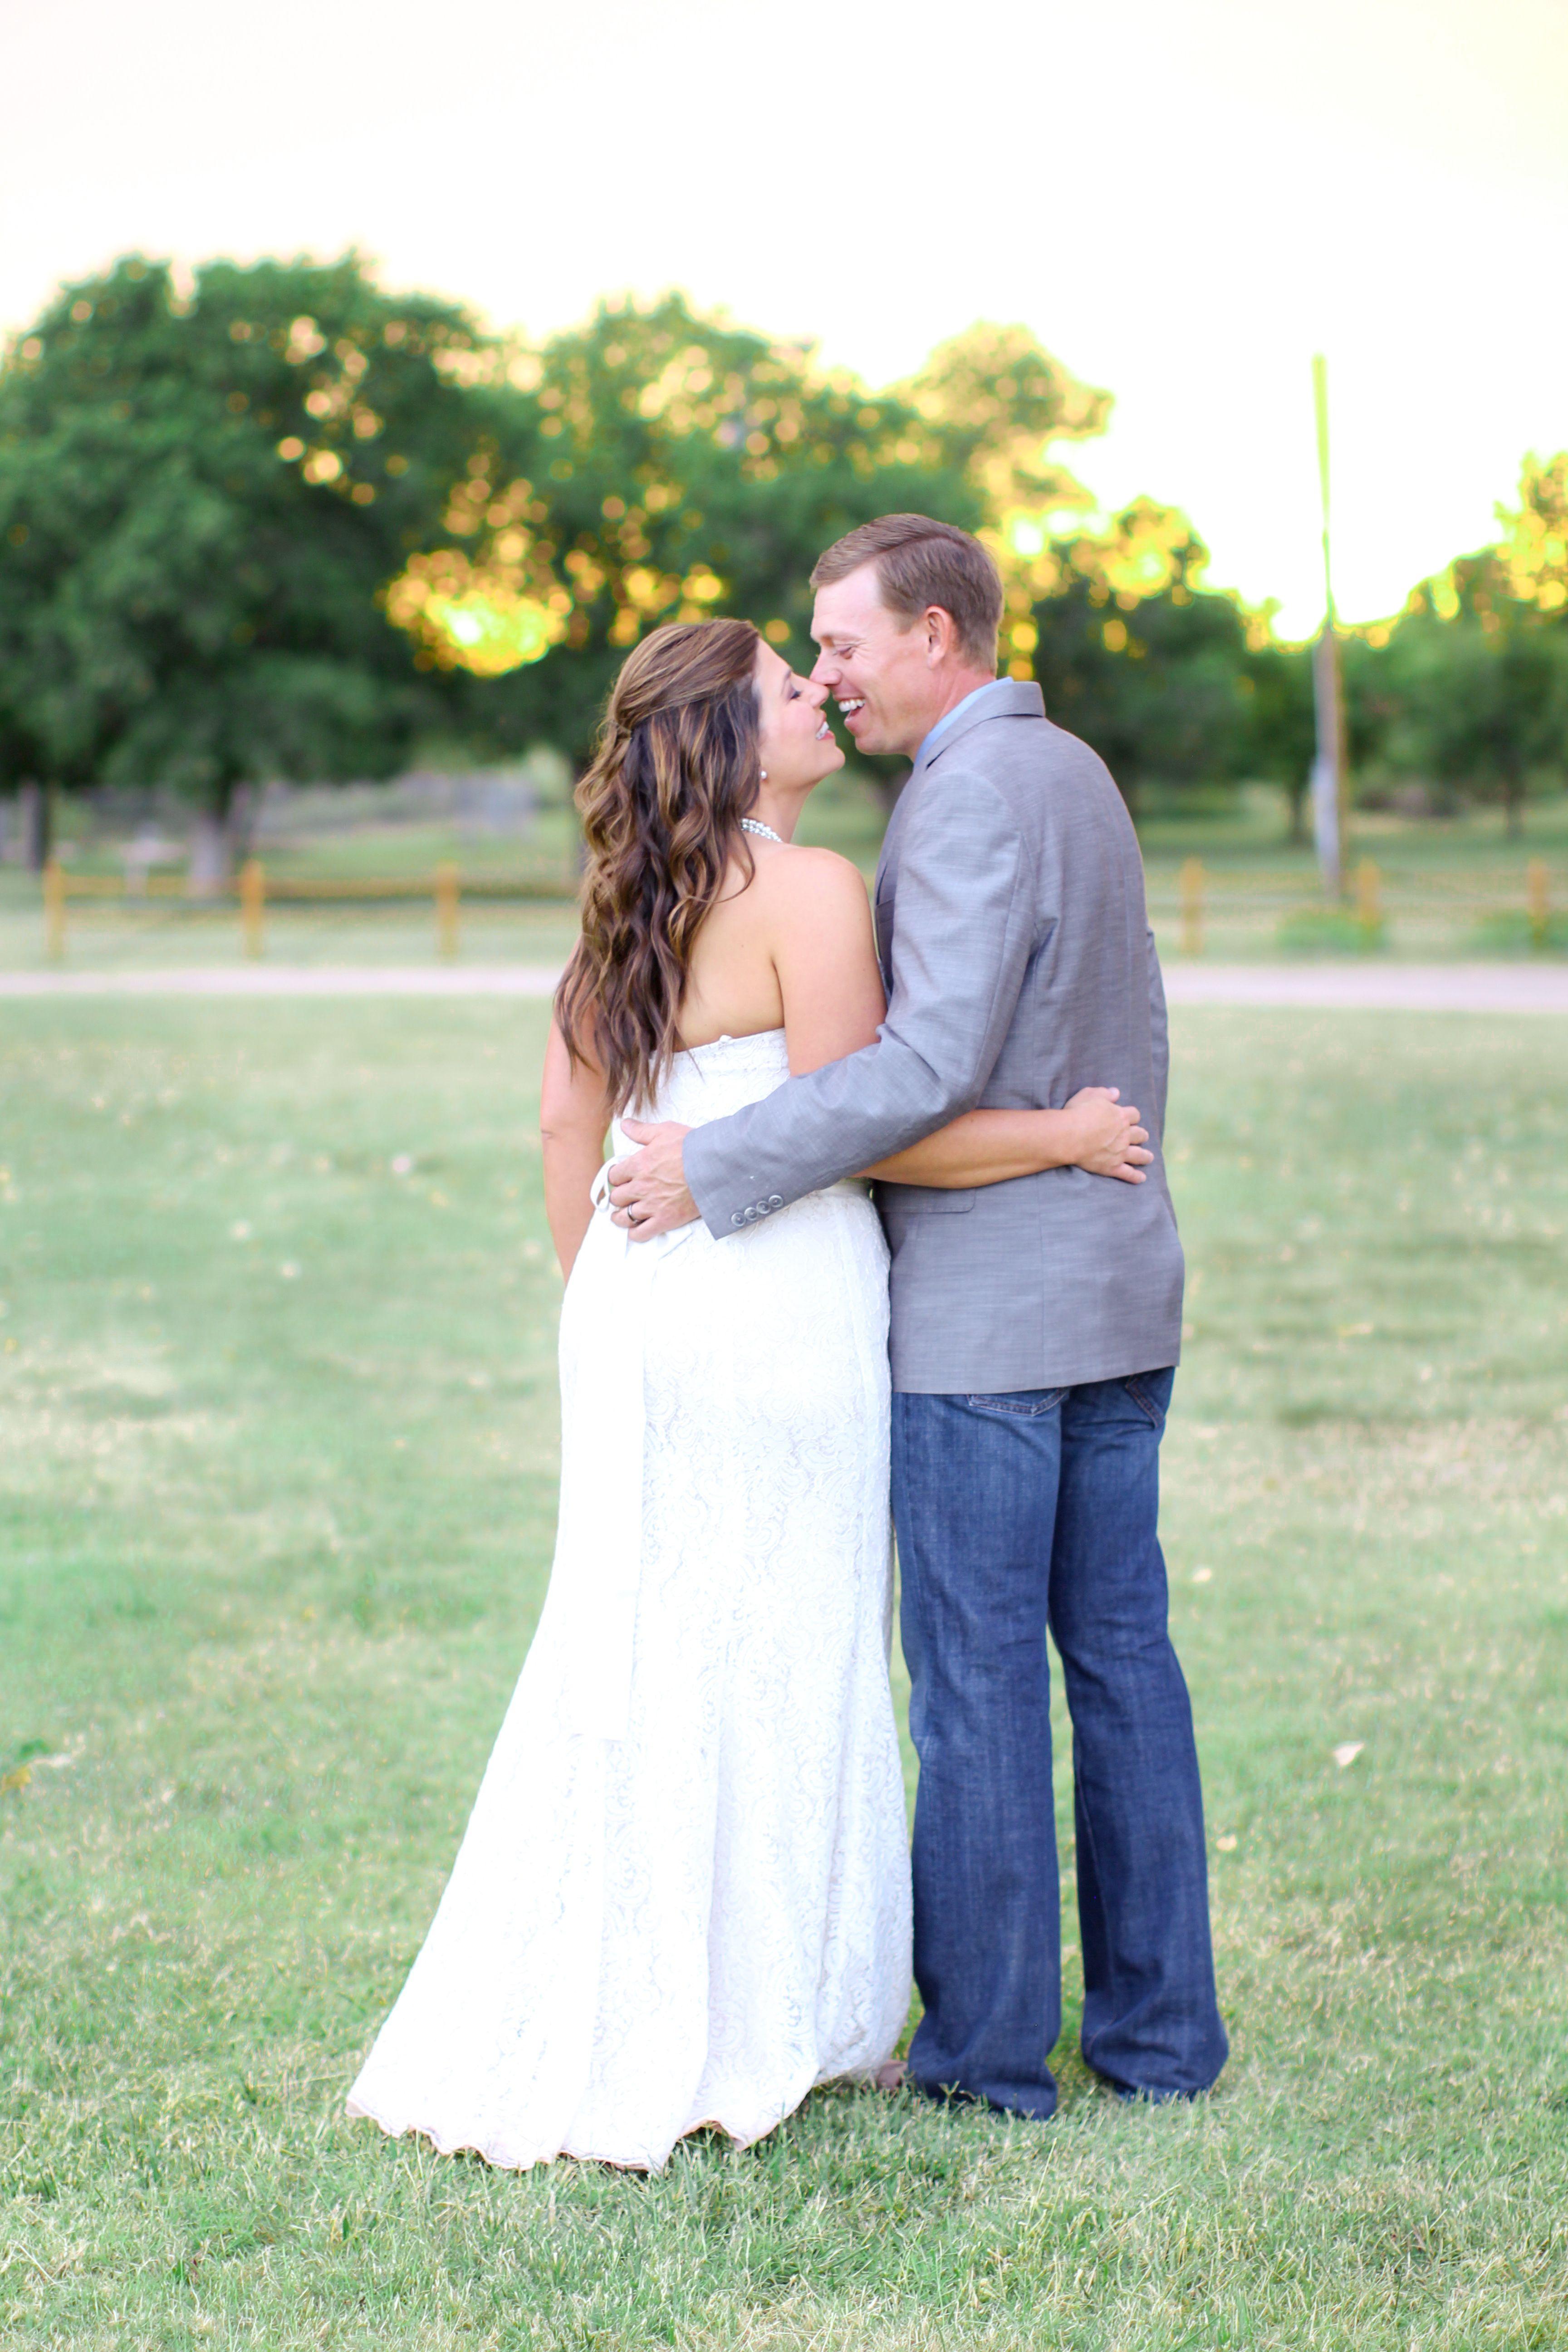 Strapless Sweetheart Neckline Lace Wedding Dress